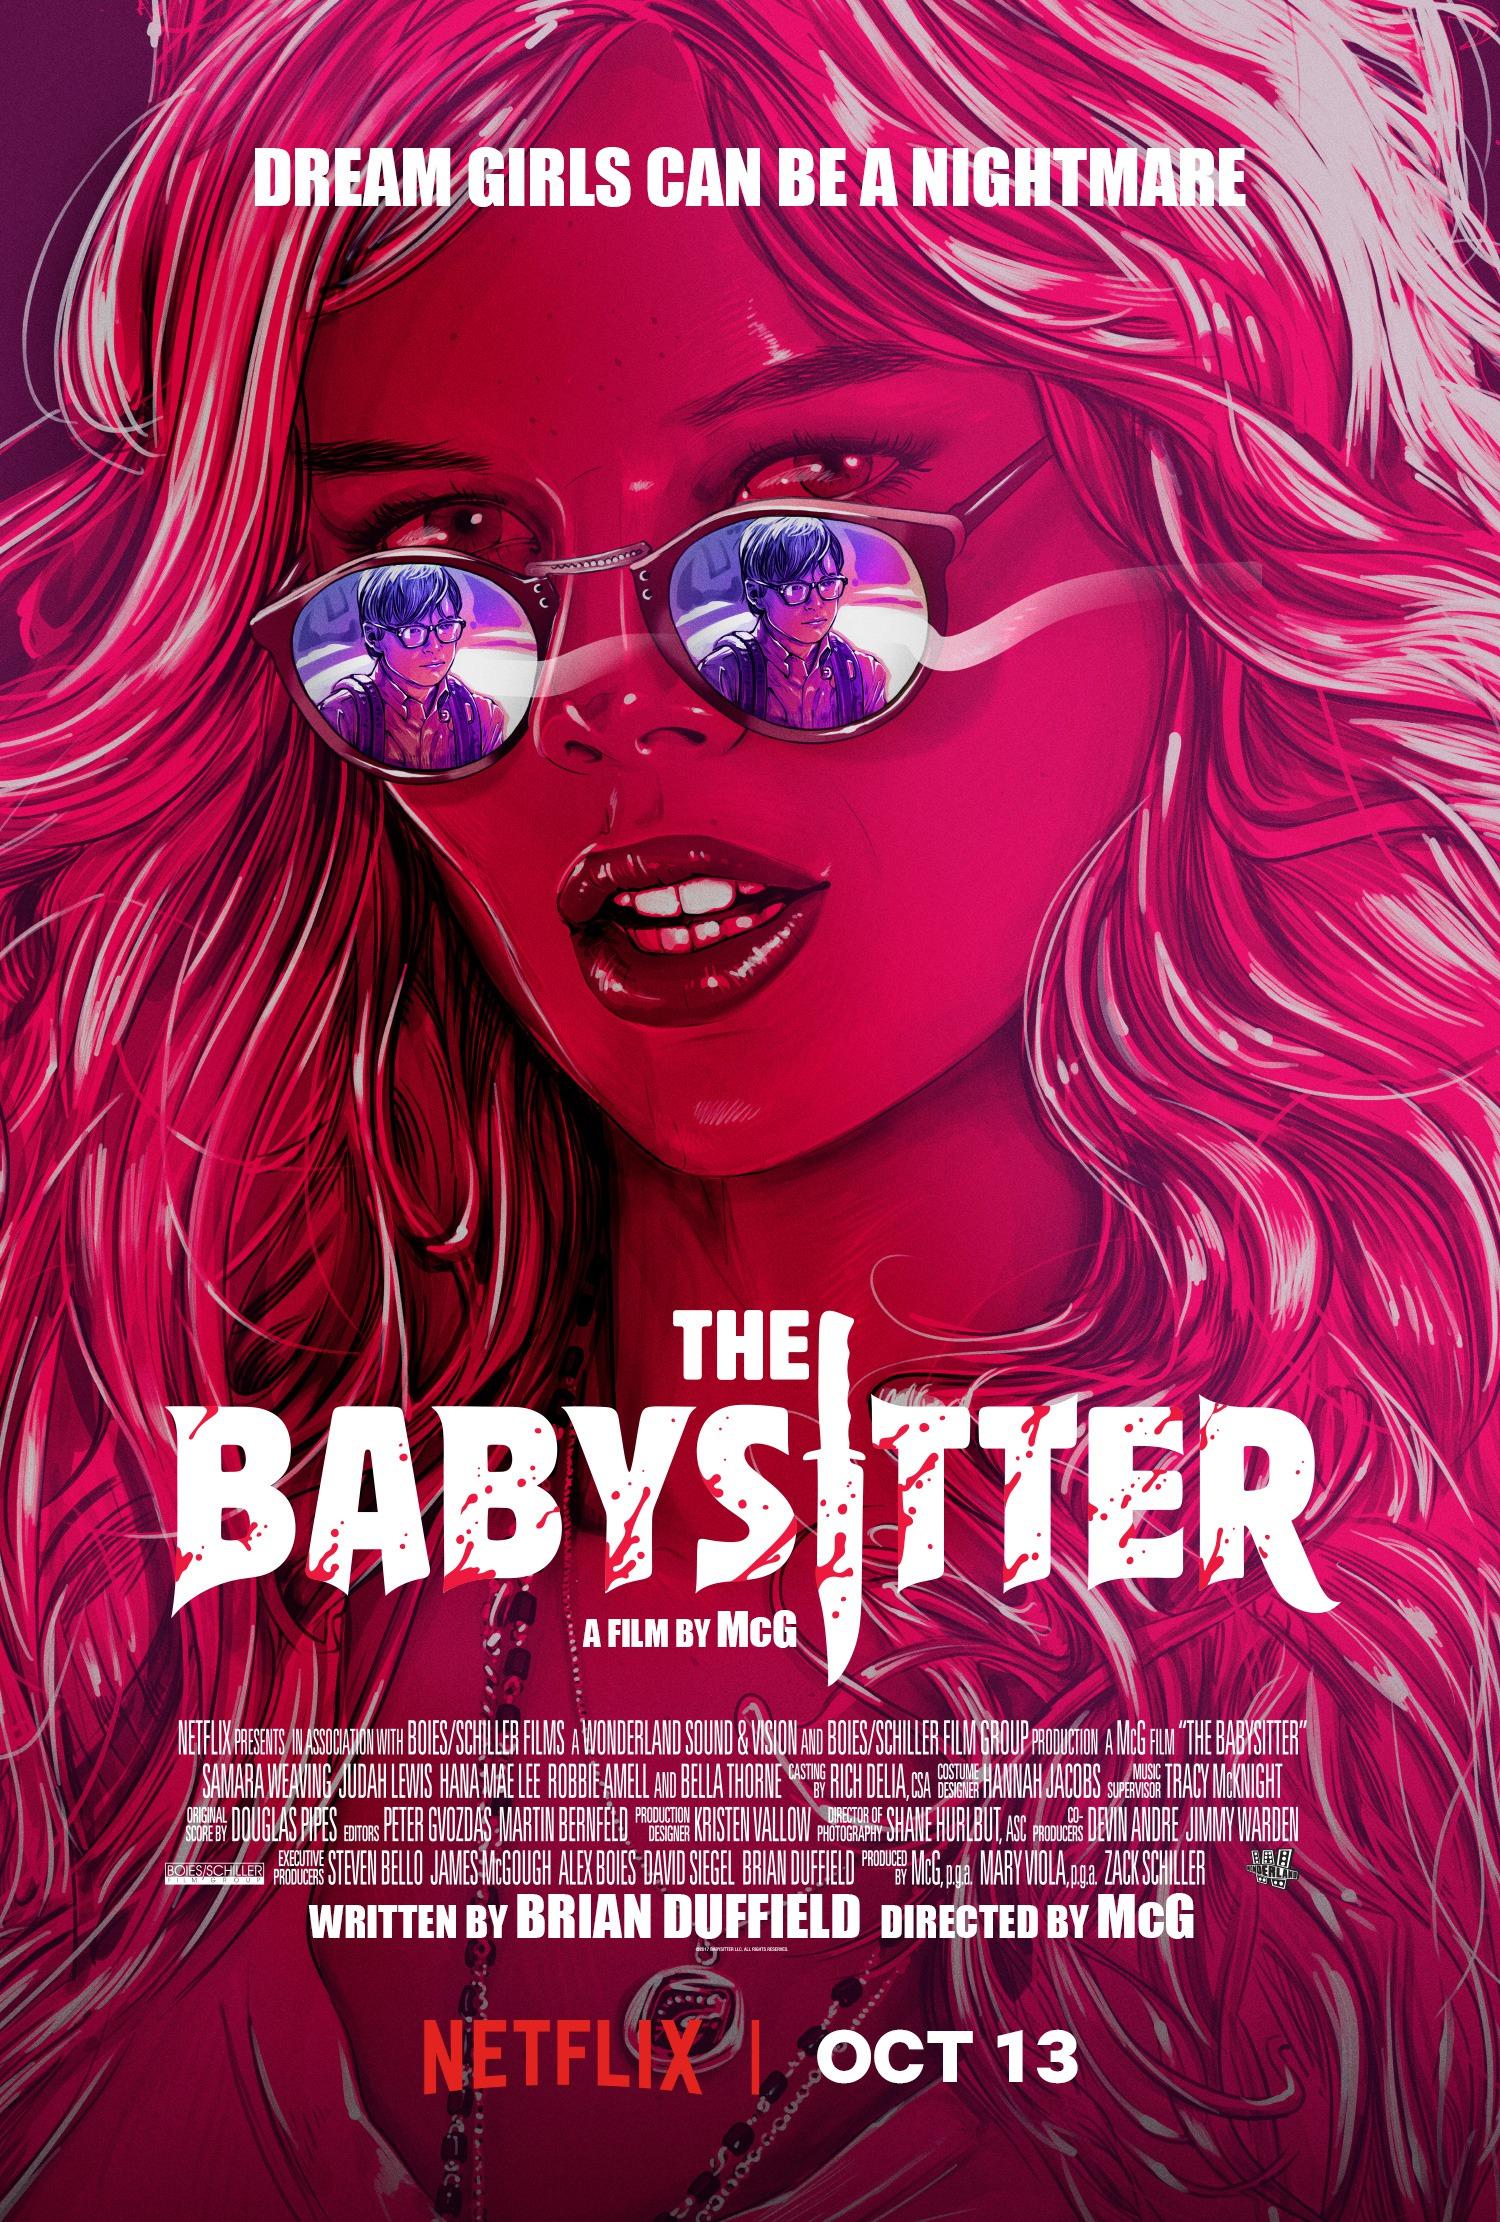 369-babysitter_xxlg.jpg